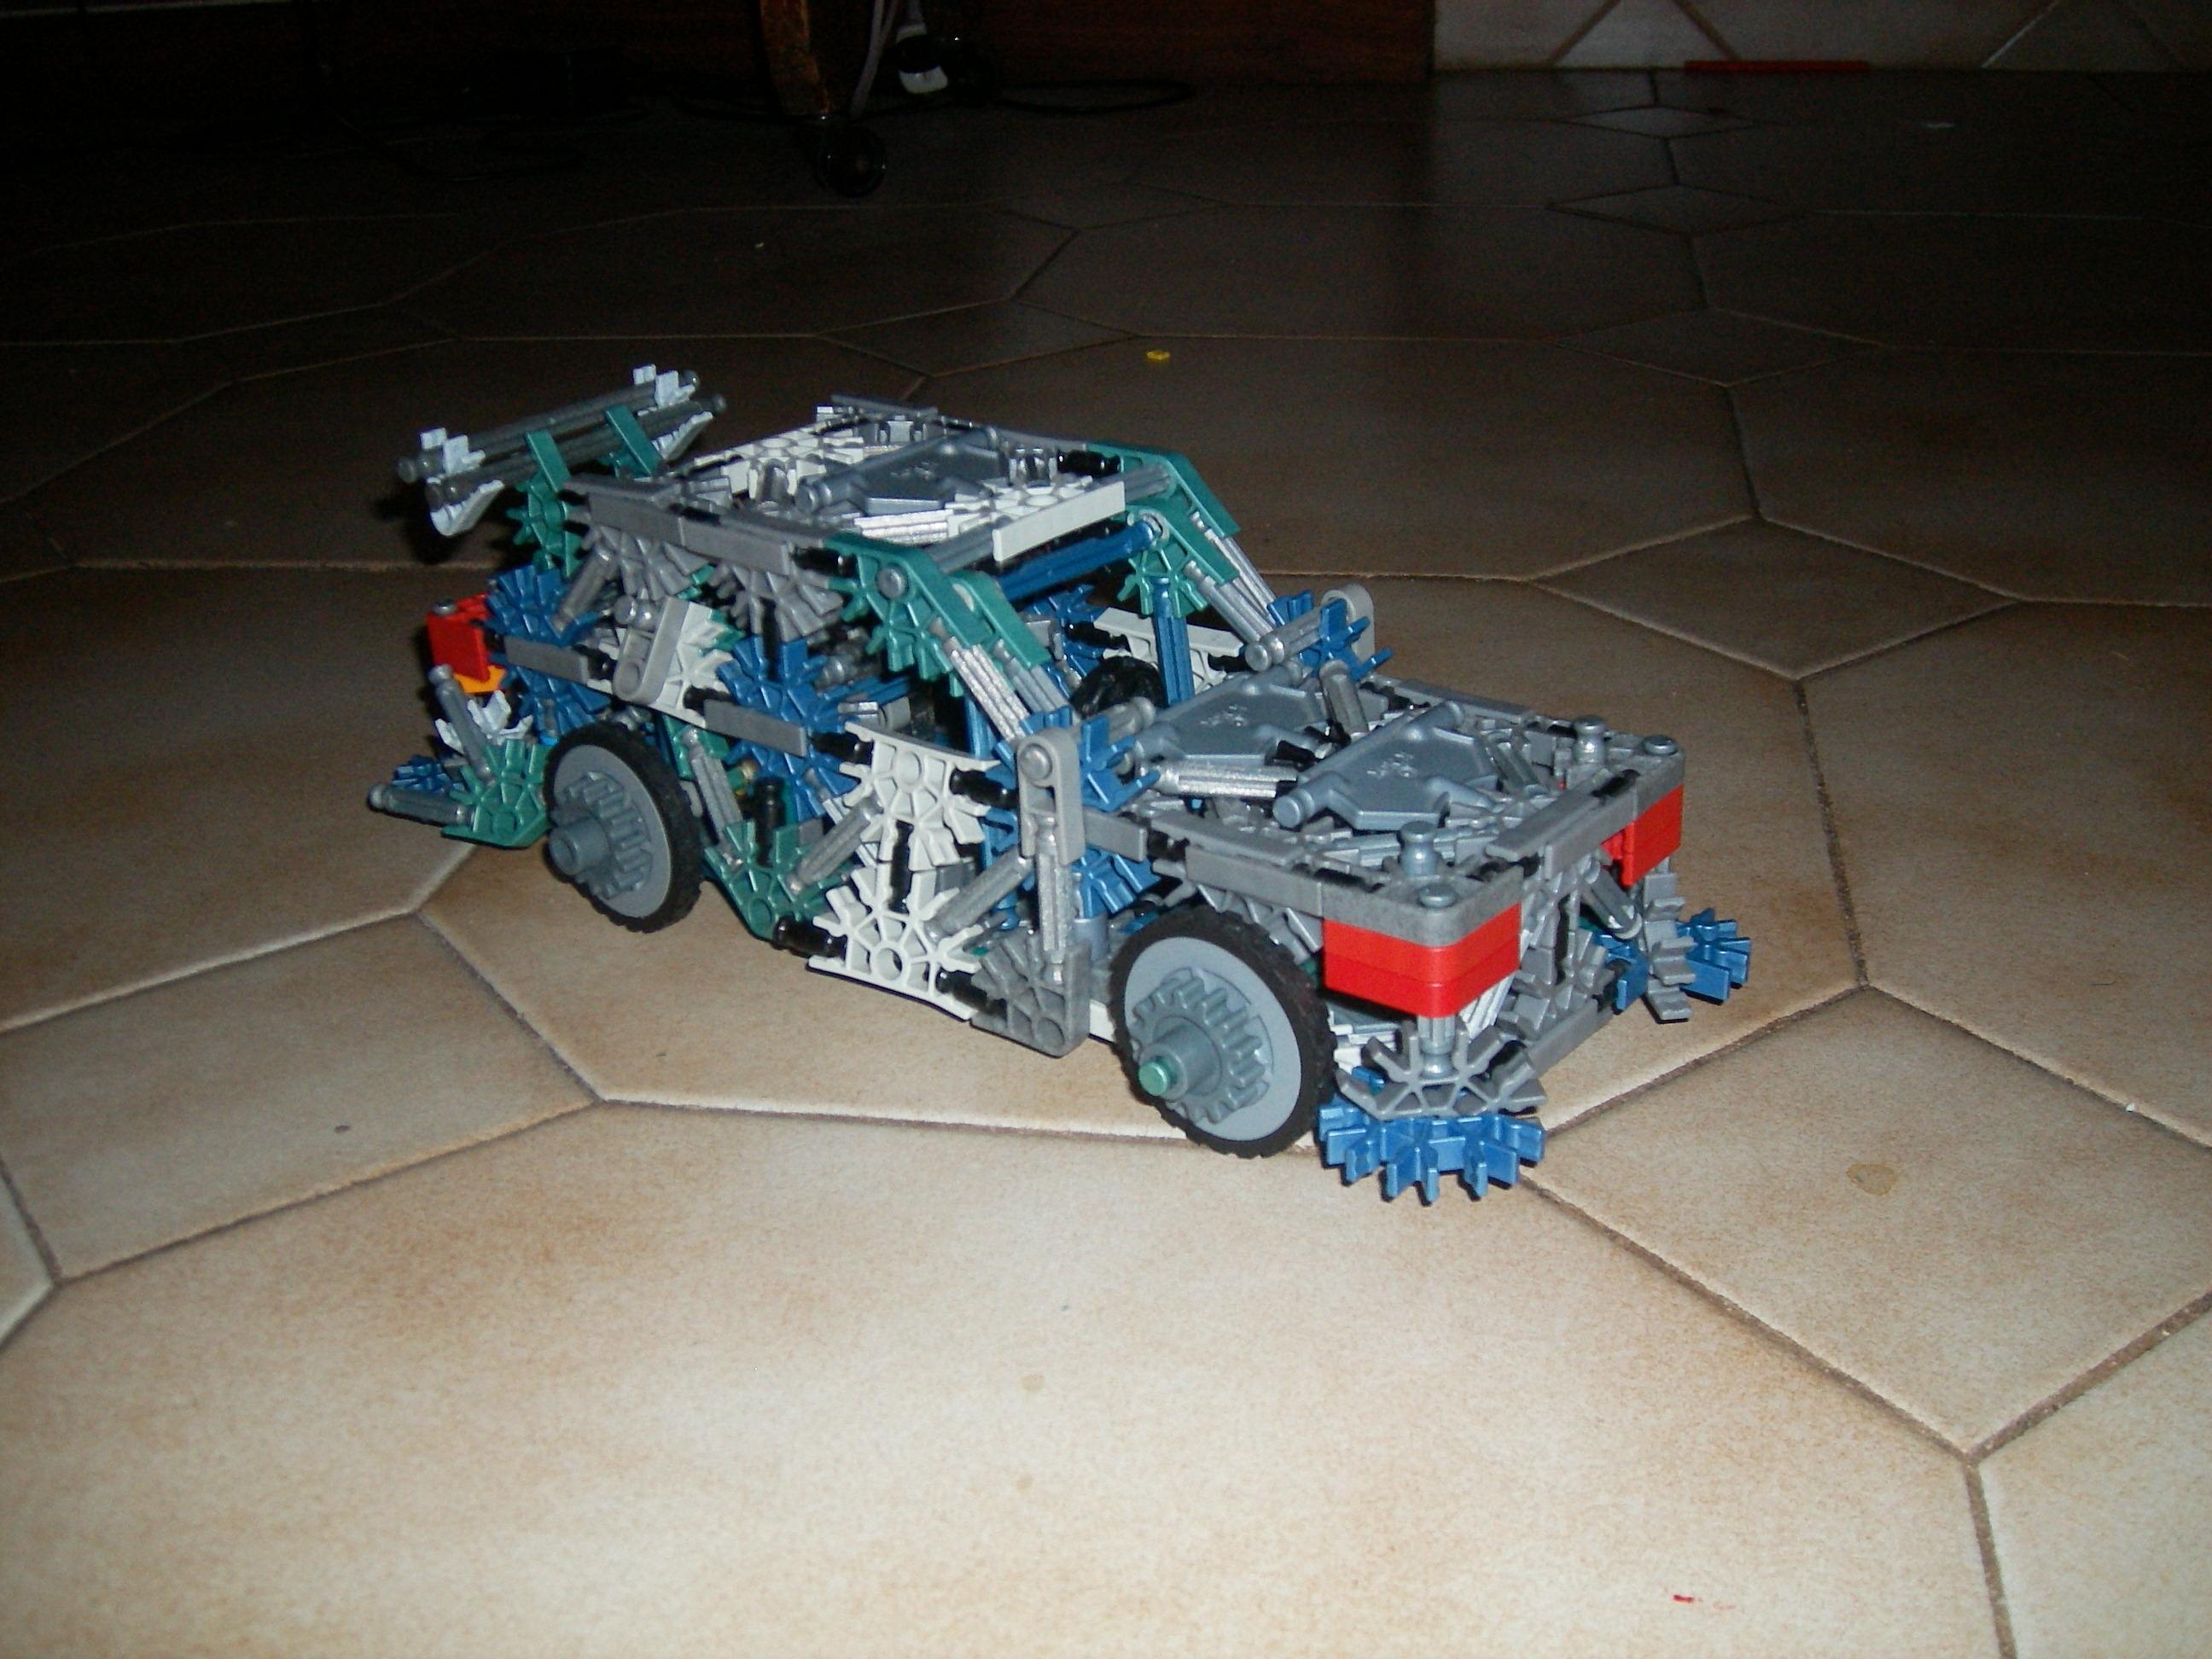 Knex car with suspension